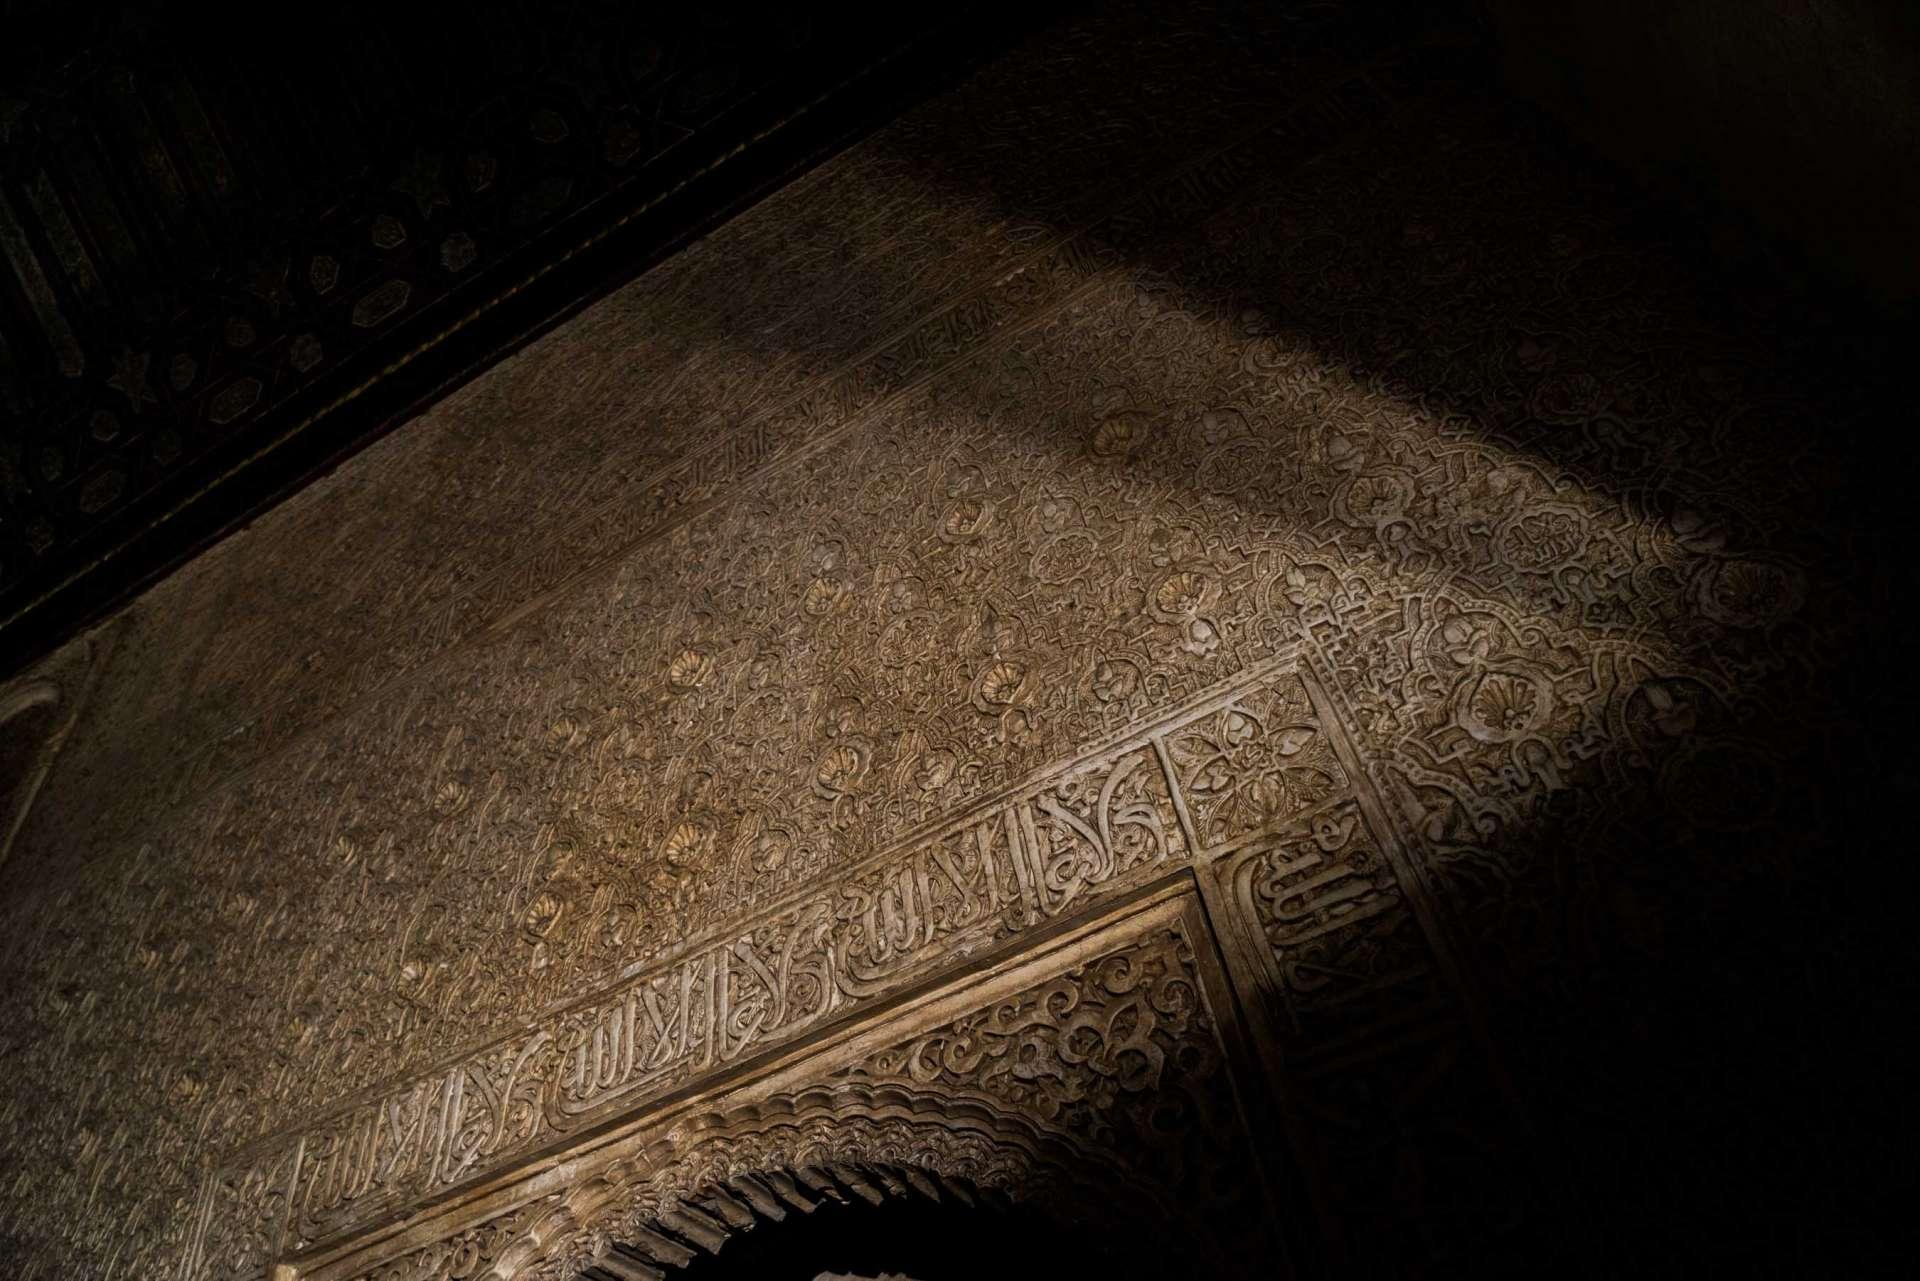 Granada Alhambra - by night Oratory 2